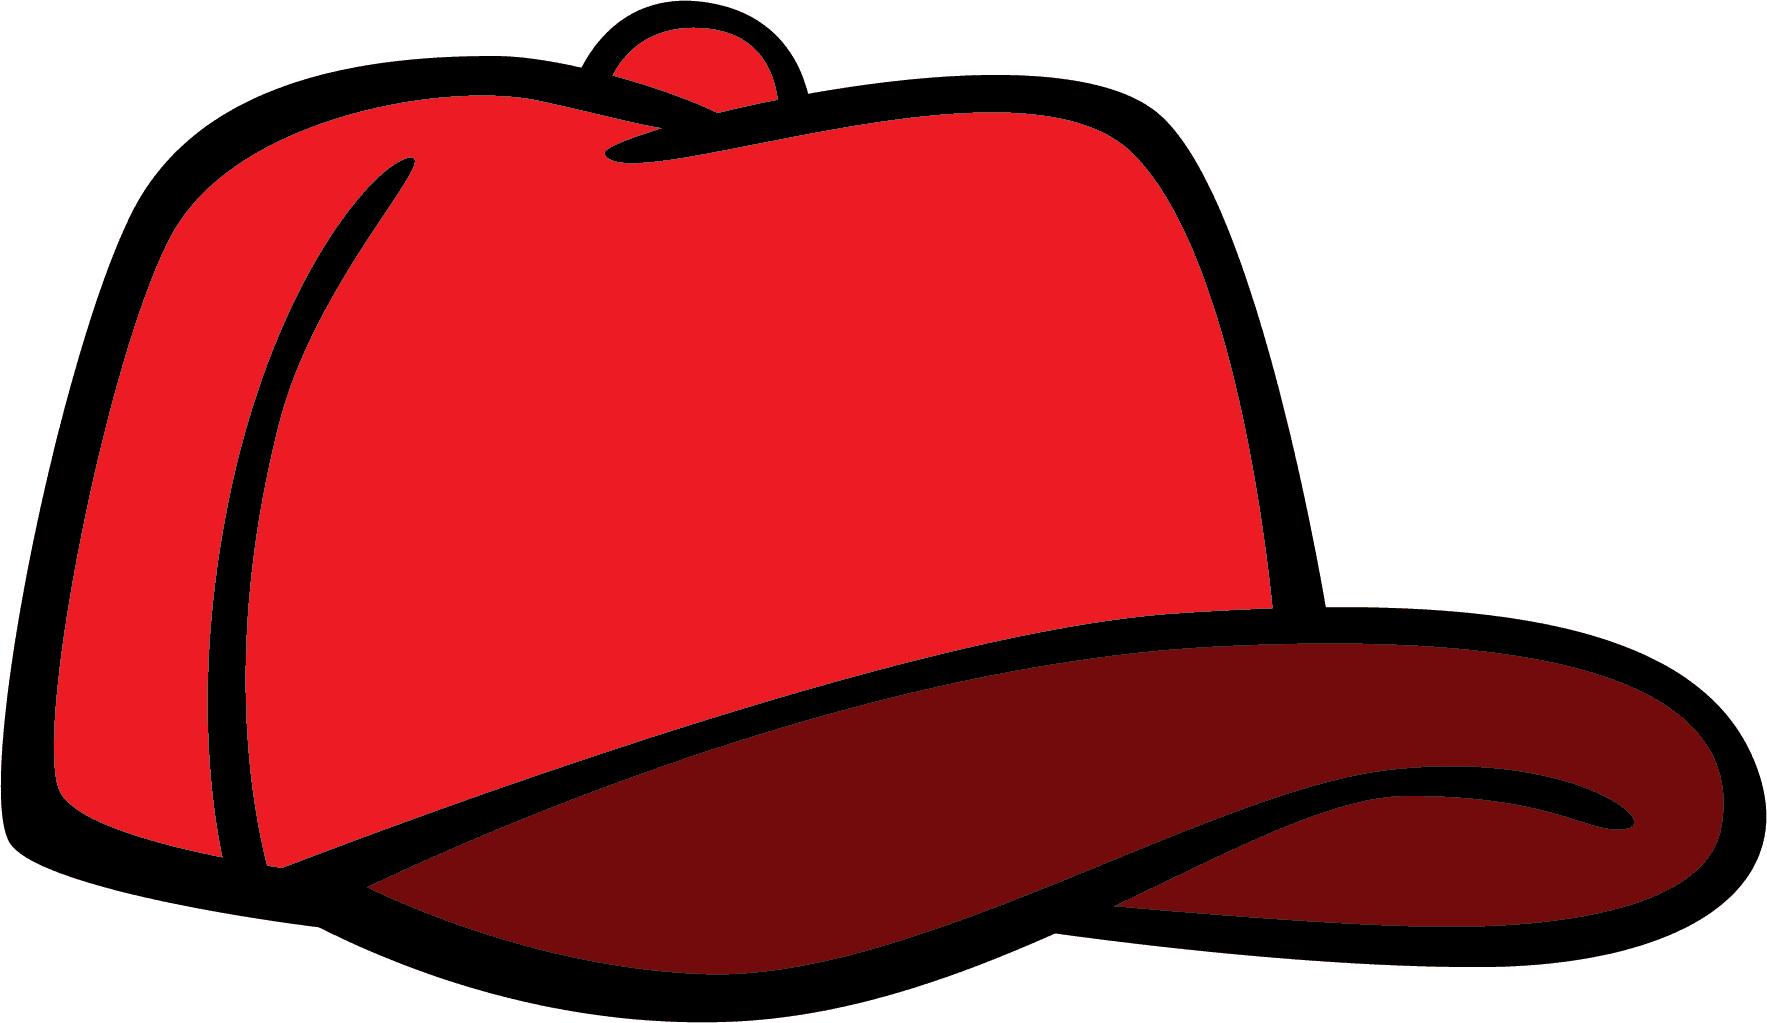 Crazy Hat Clipart-Crazy Hat Clipart-1